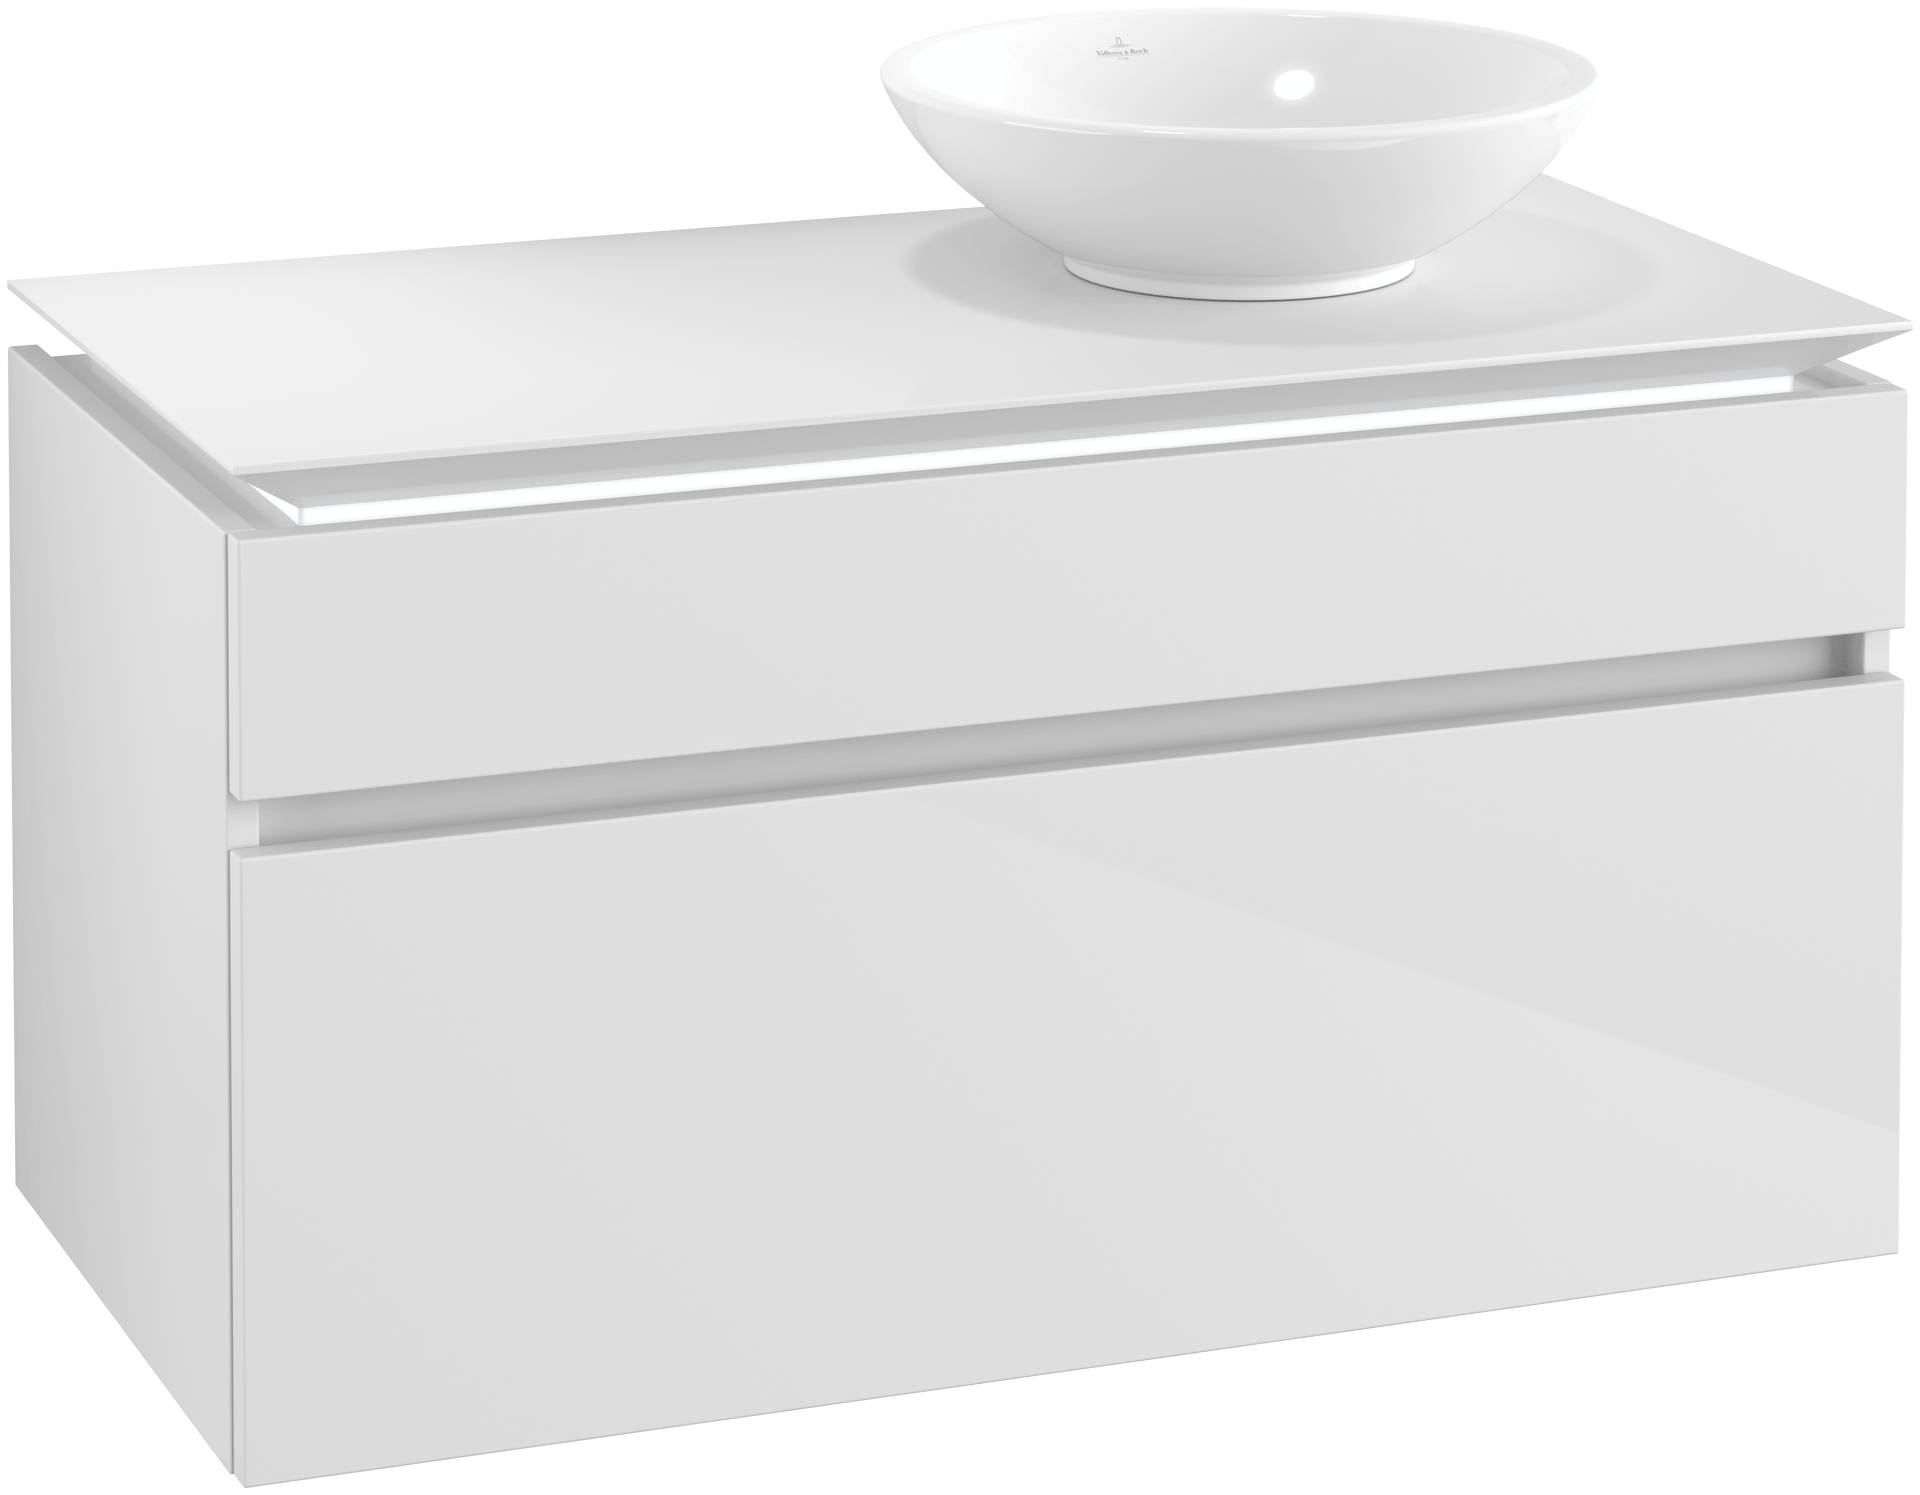 Villeroy & Boch Villeroy & Boch Legato - Meuble sous lavabo with 2 drawers & 1 cut-out right 1000 x 550 x 500mm blanc lustré